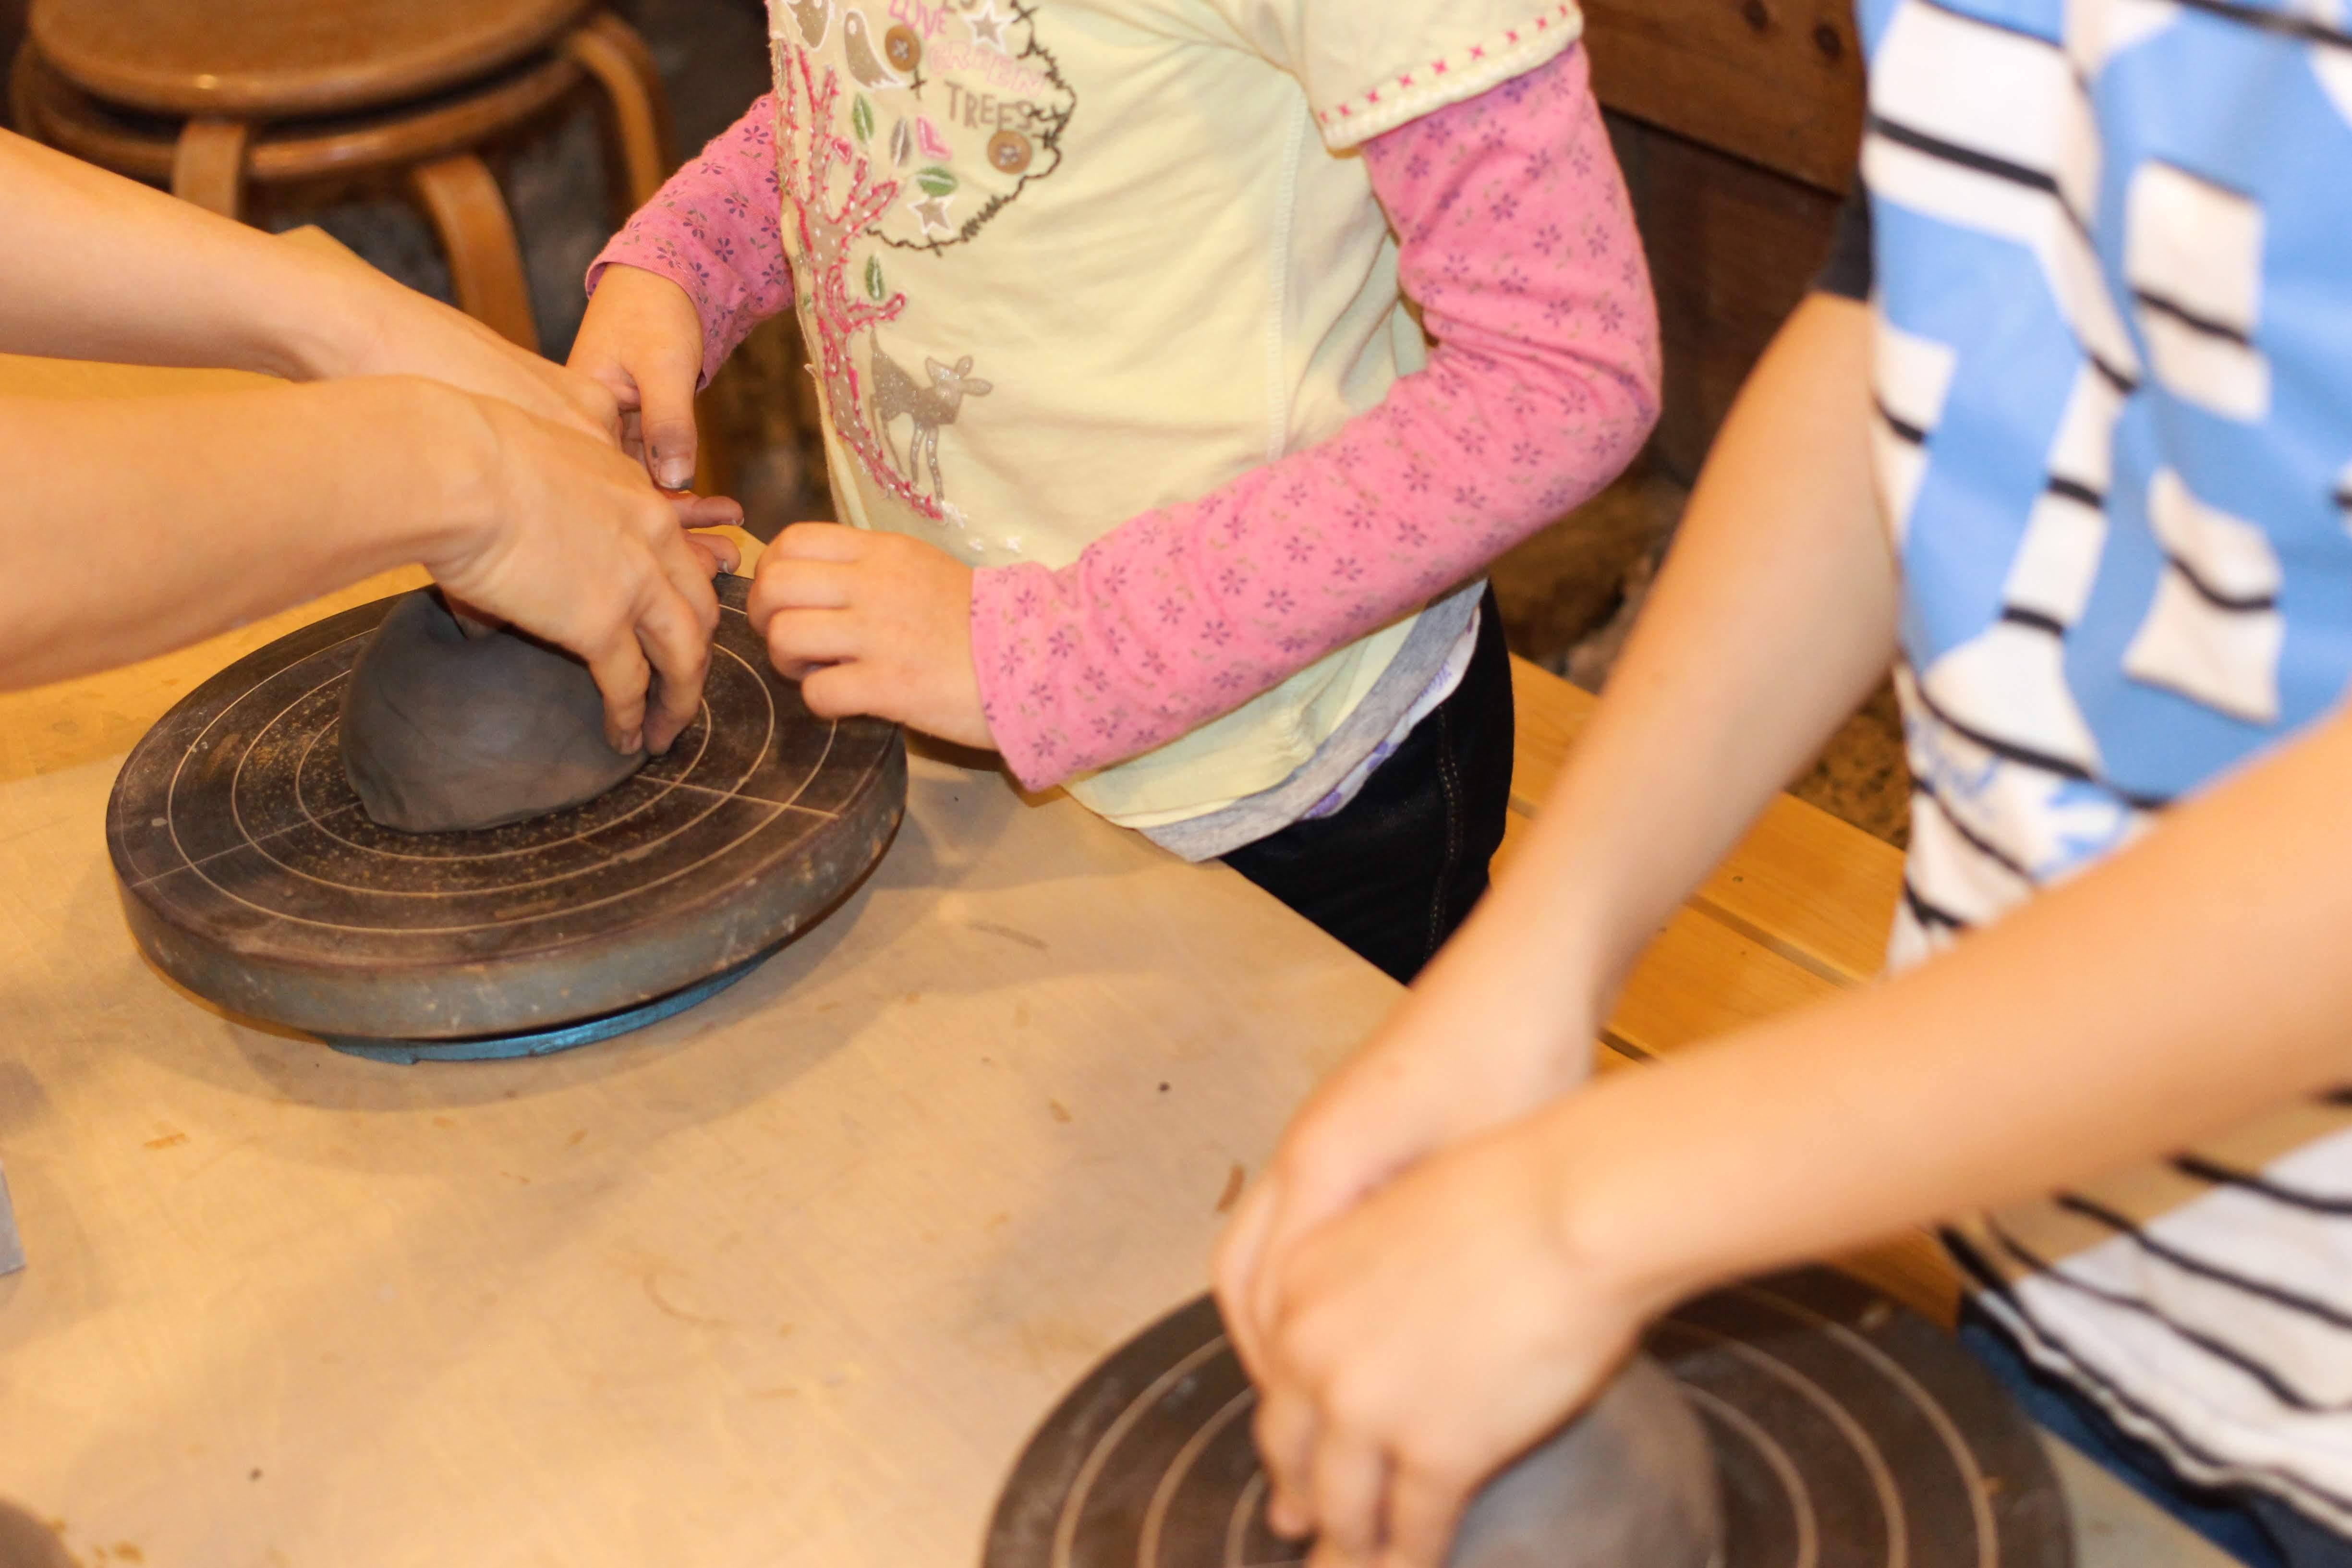 Pottery workshop kawagoe touho yamawa activity kawagoe with kids